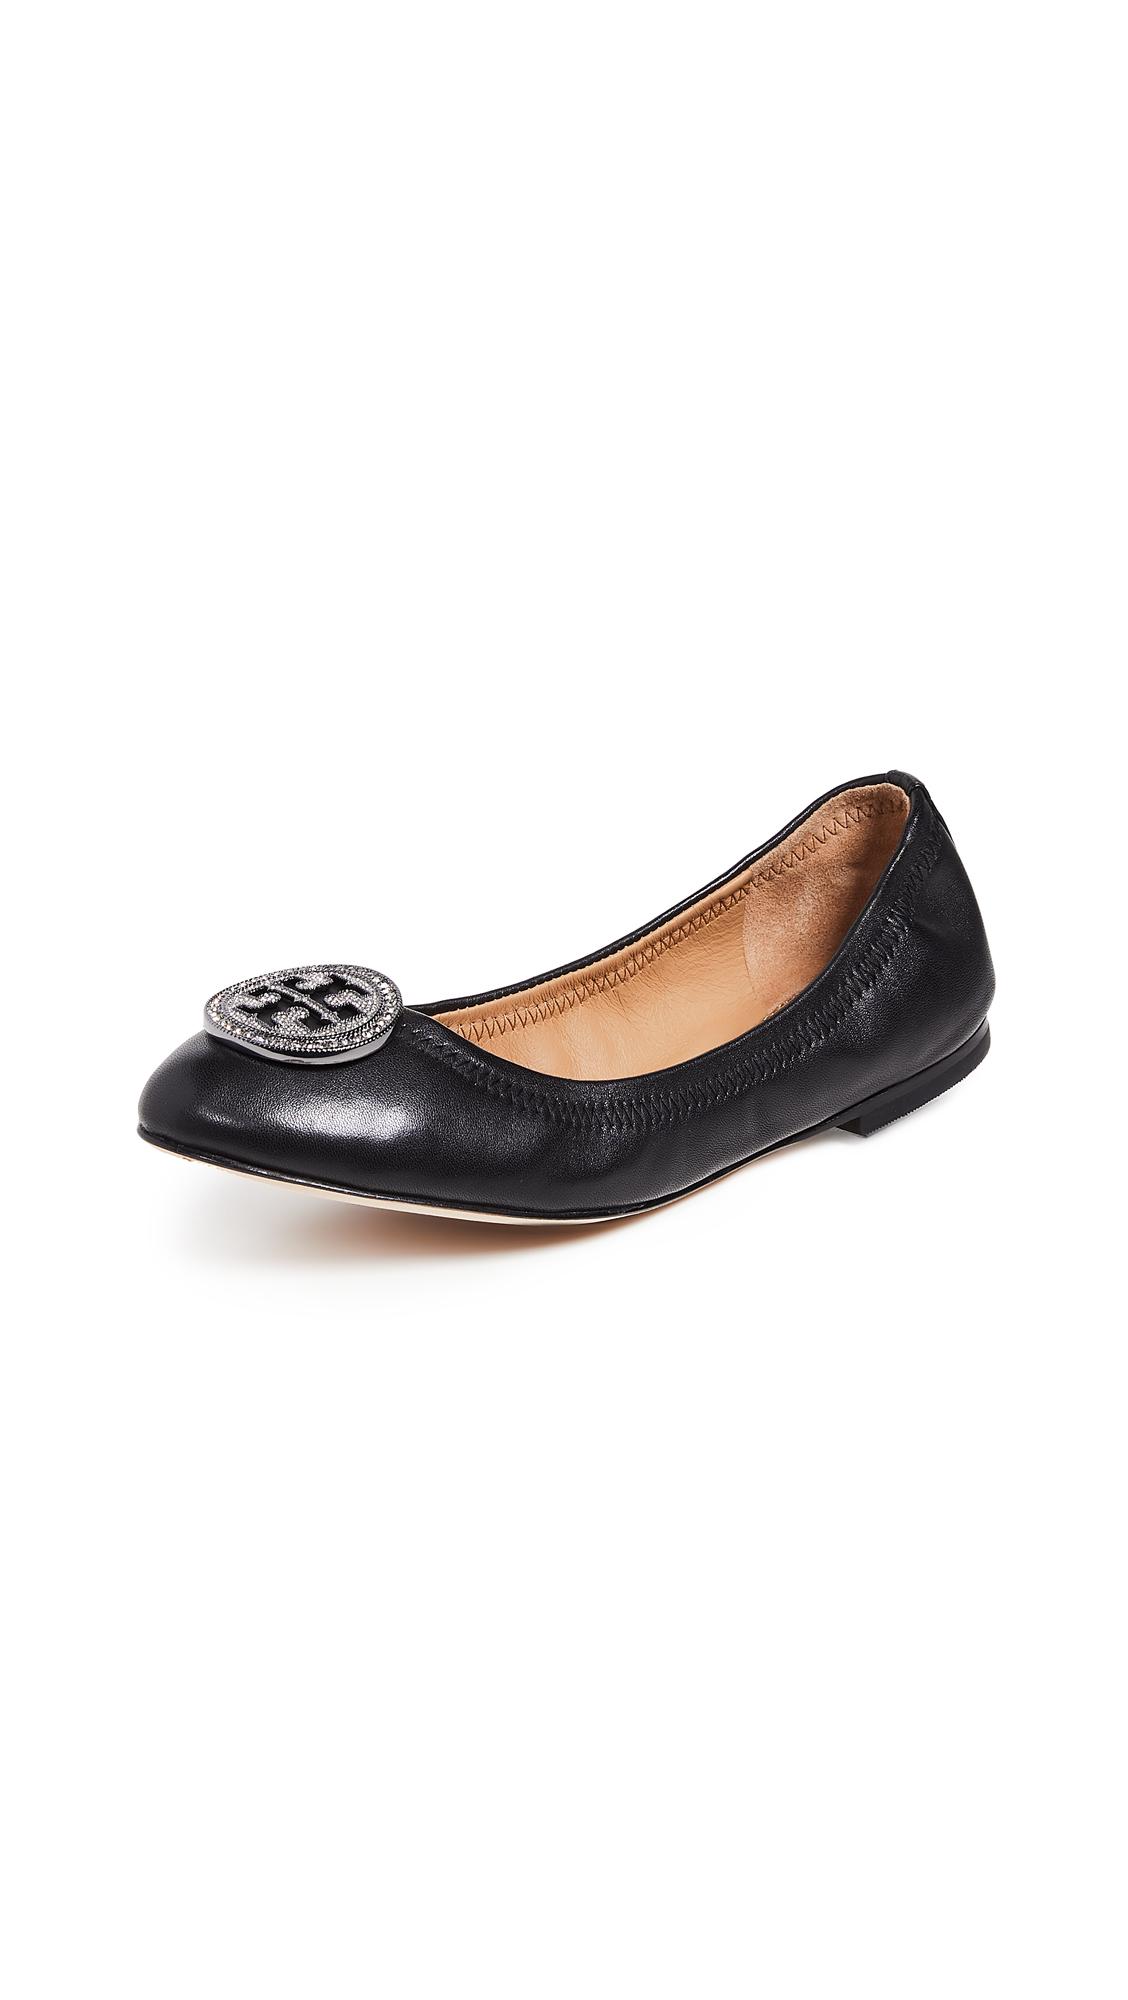 982f451bb88 Tory Burch Liana Ballet Flats In Perfect Black/Gunmetal | ModeSens